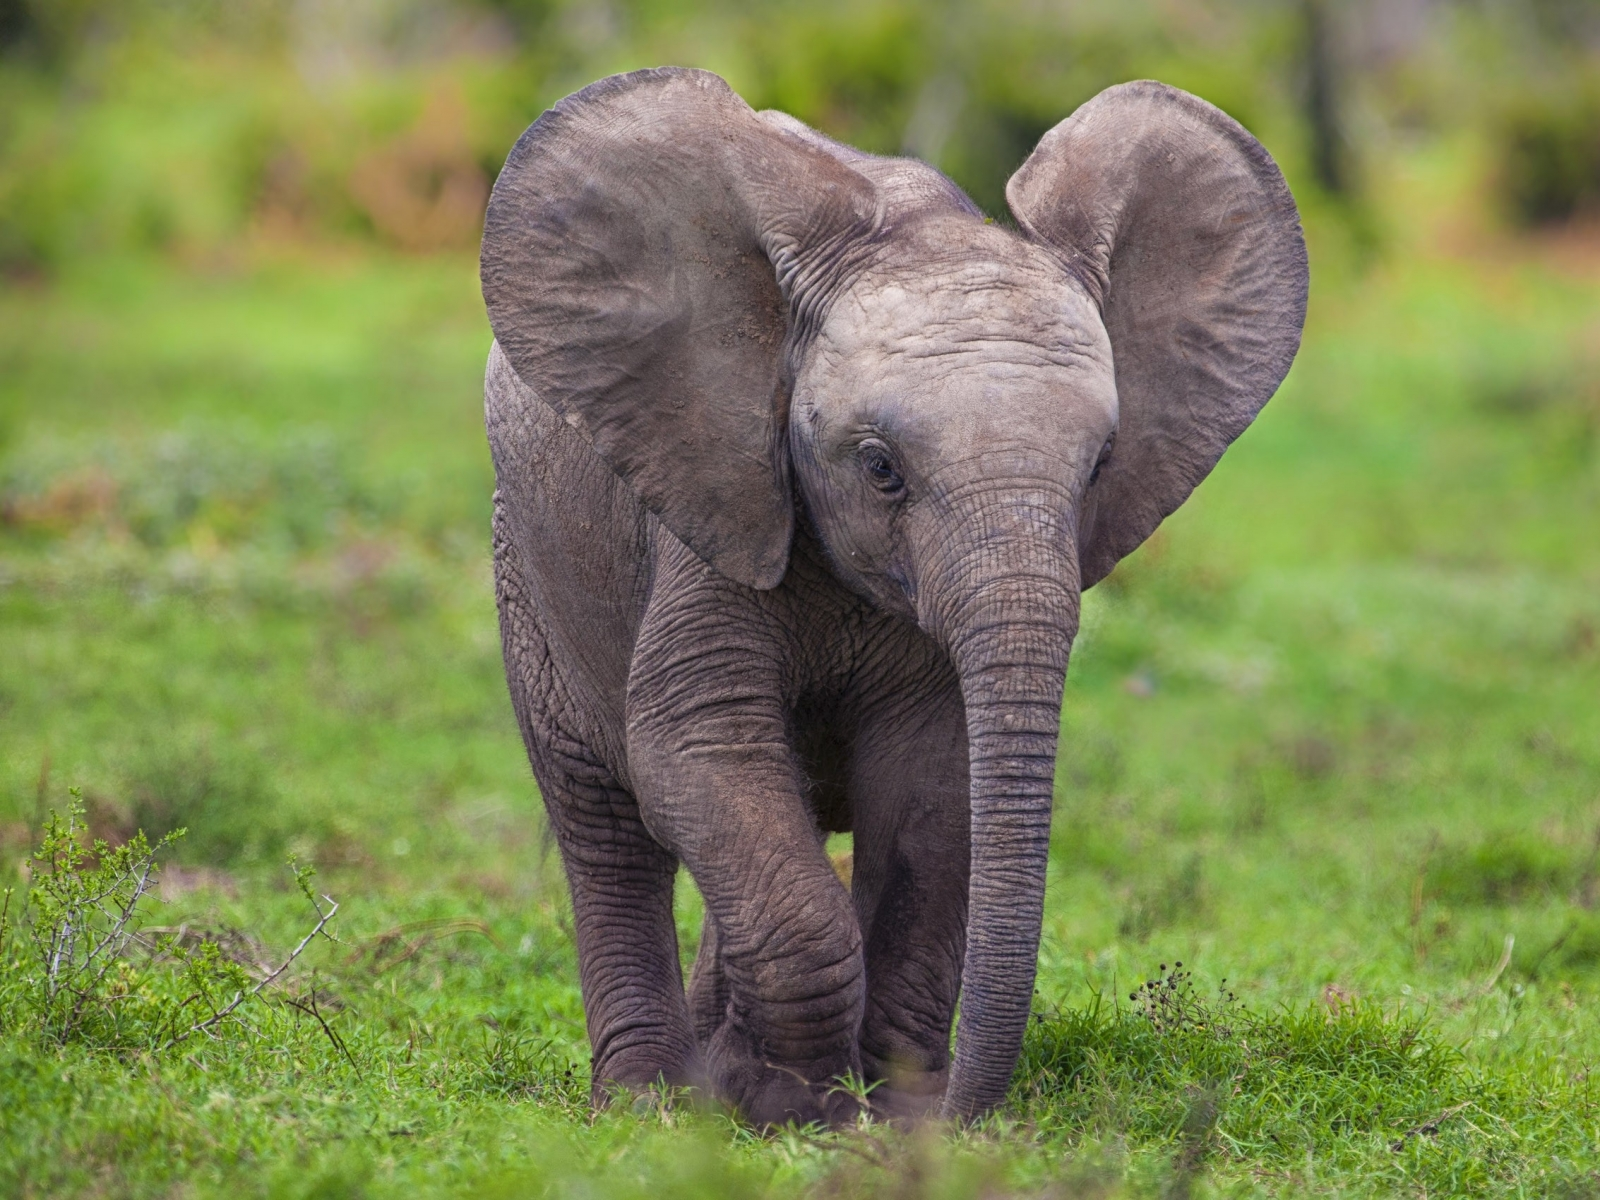 Baby elephants wallpaper - photo#19